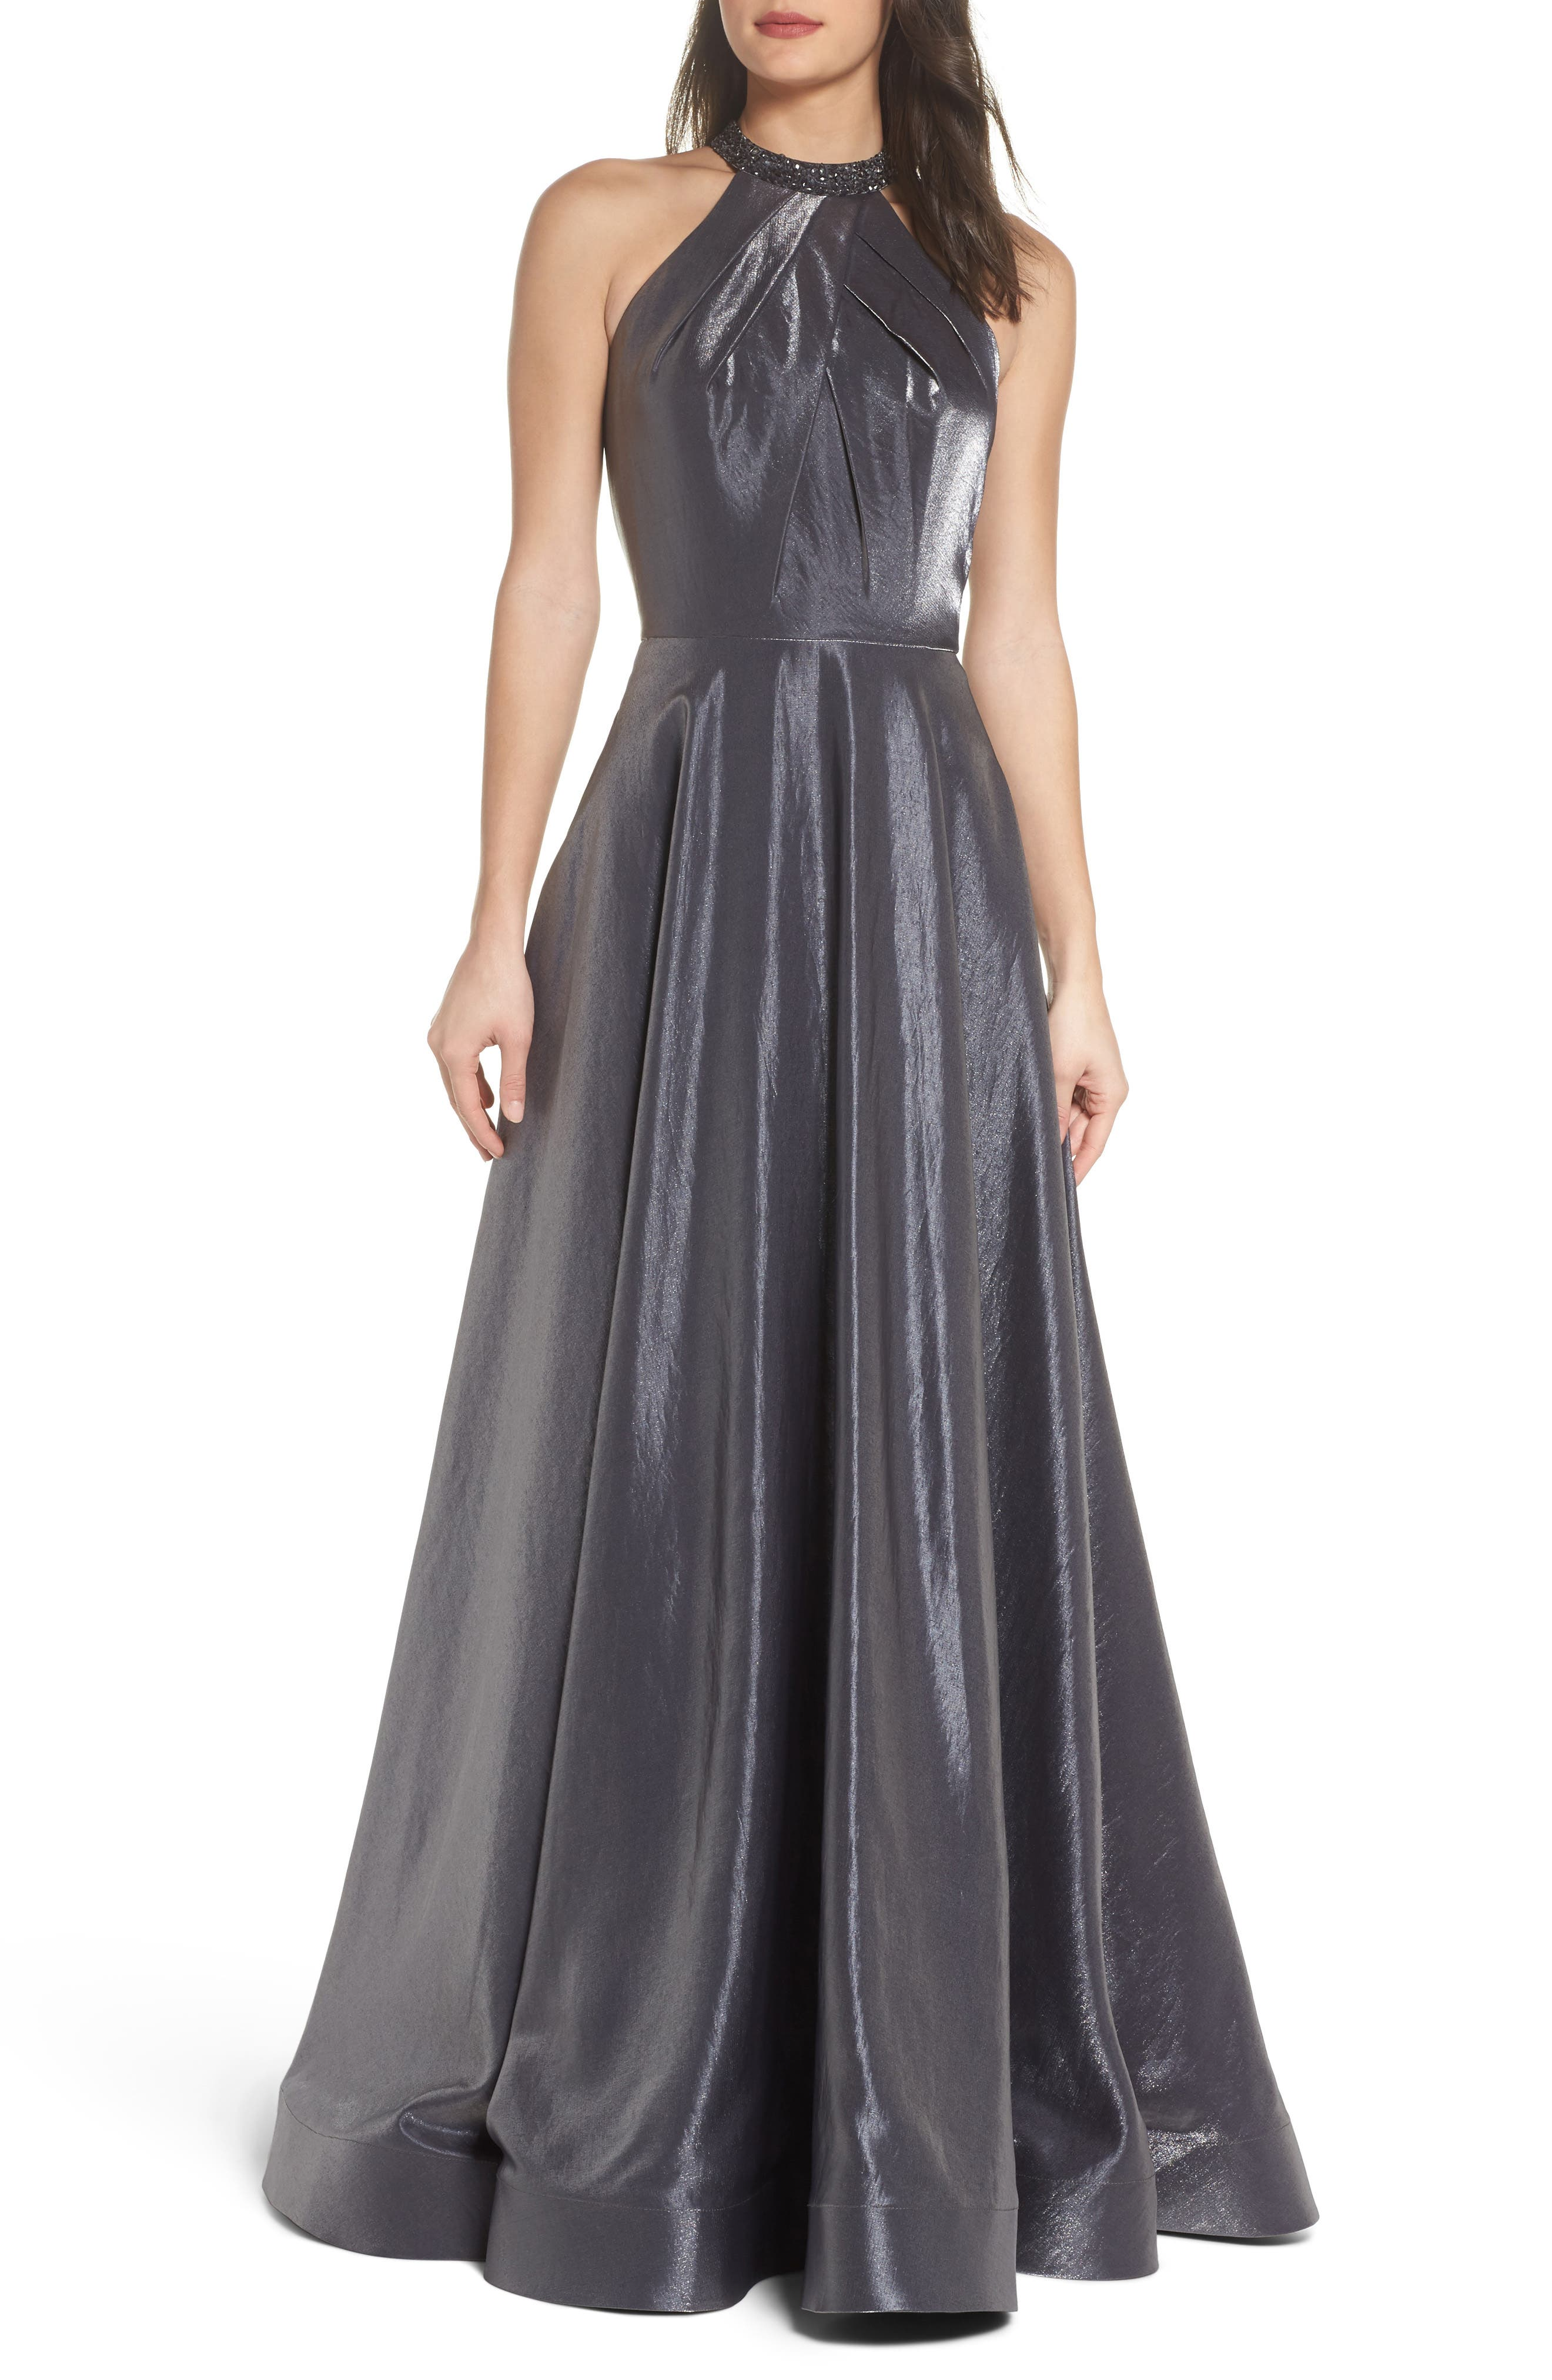 Alternate Image 1 Selected - La Femme Beaded Halter Neck A-Line Gown